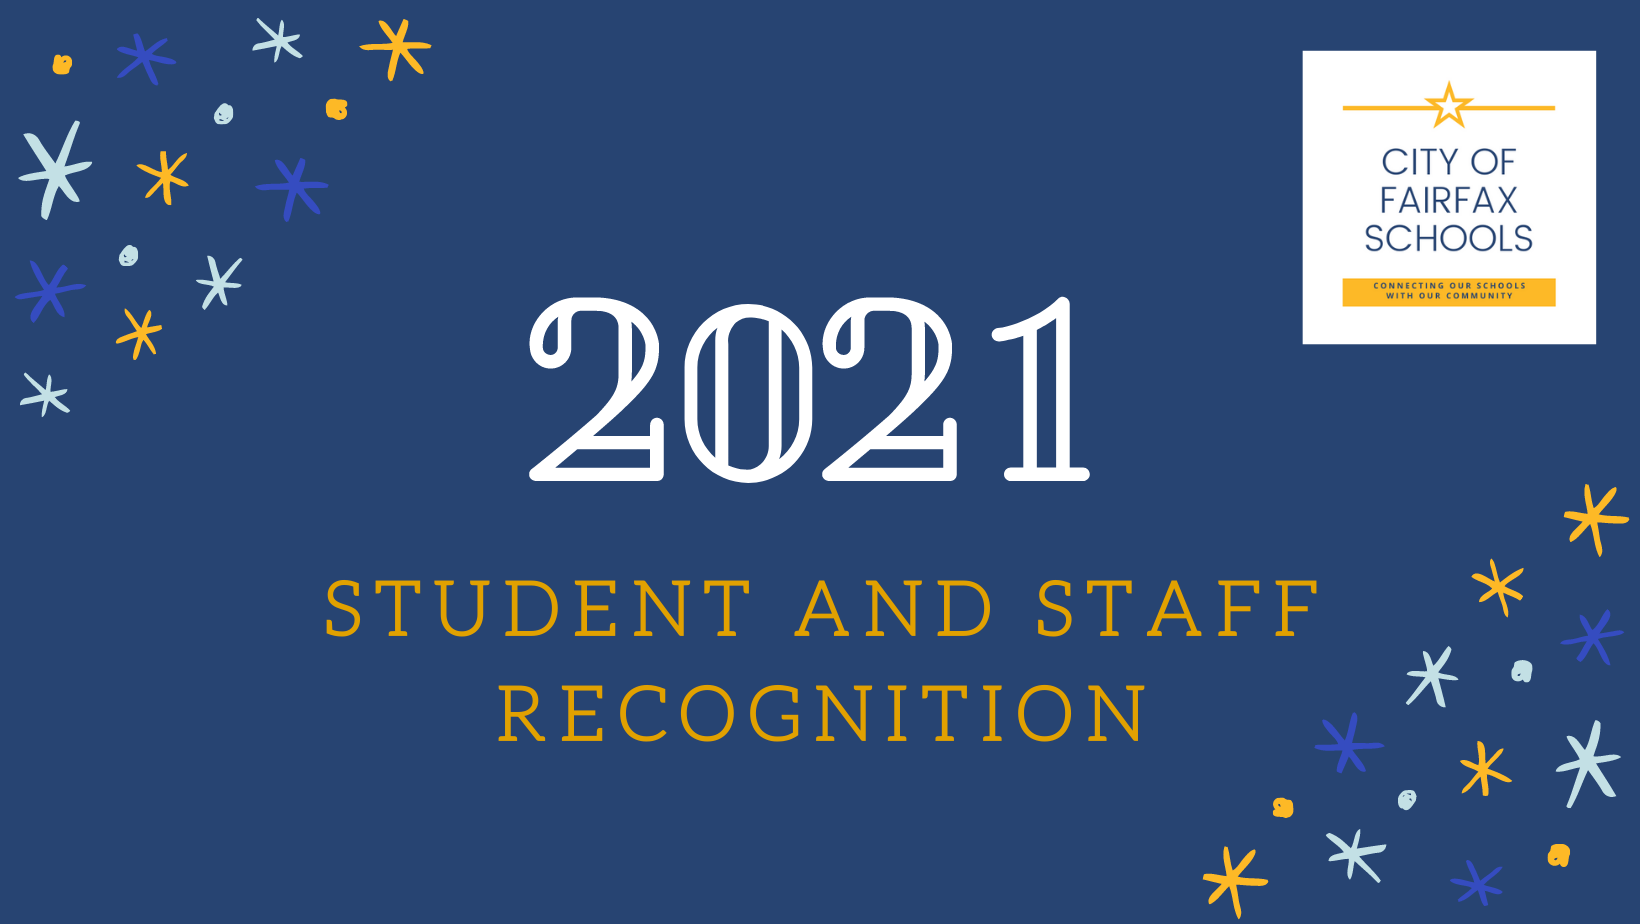 logo for 2021 recognition